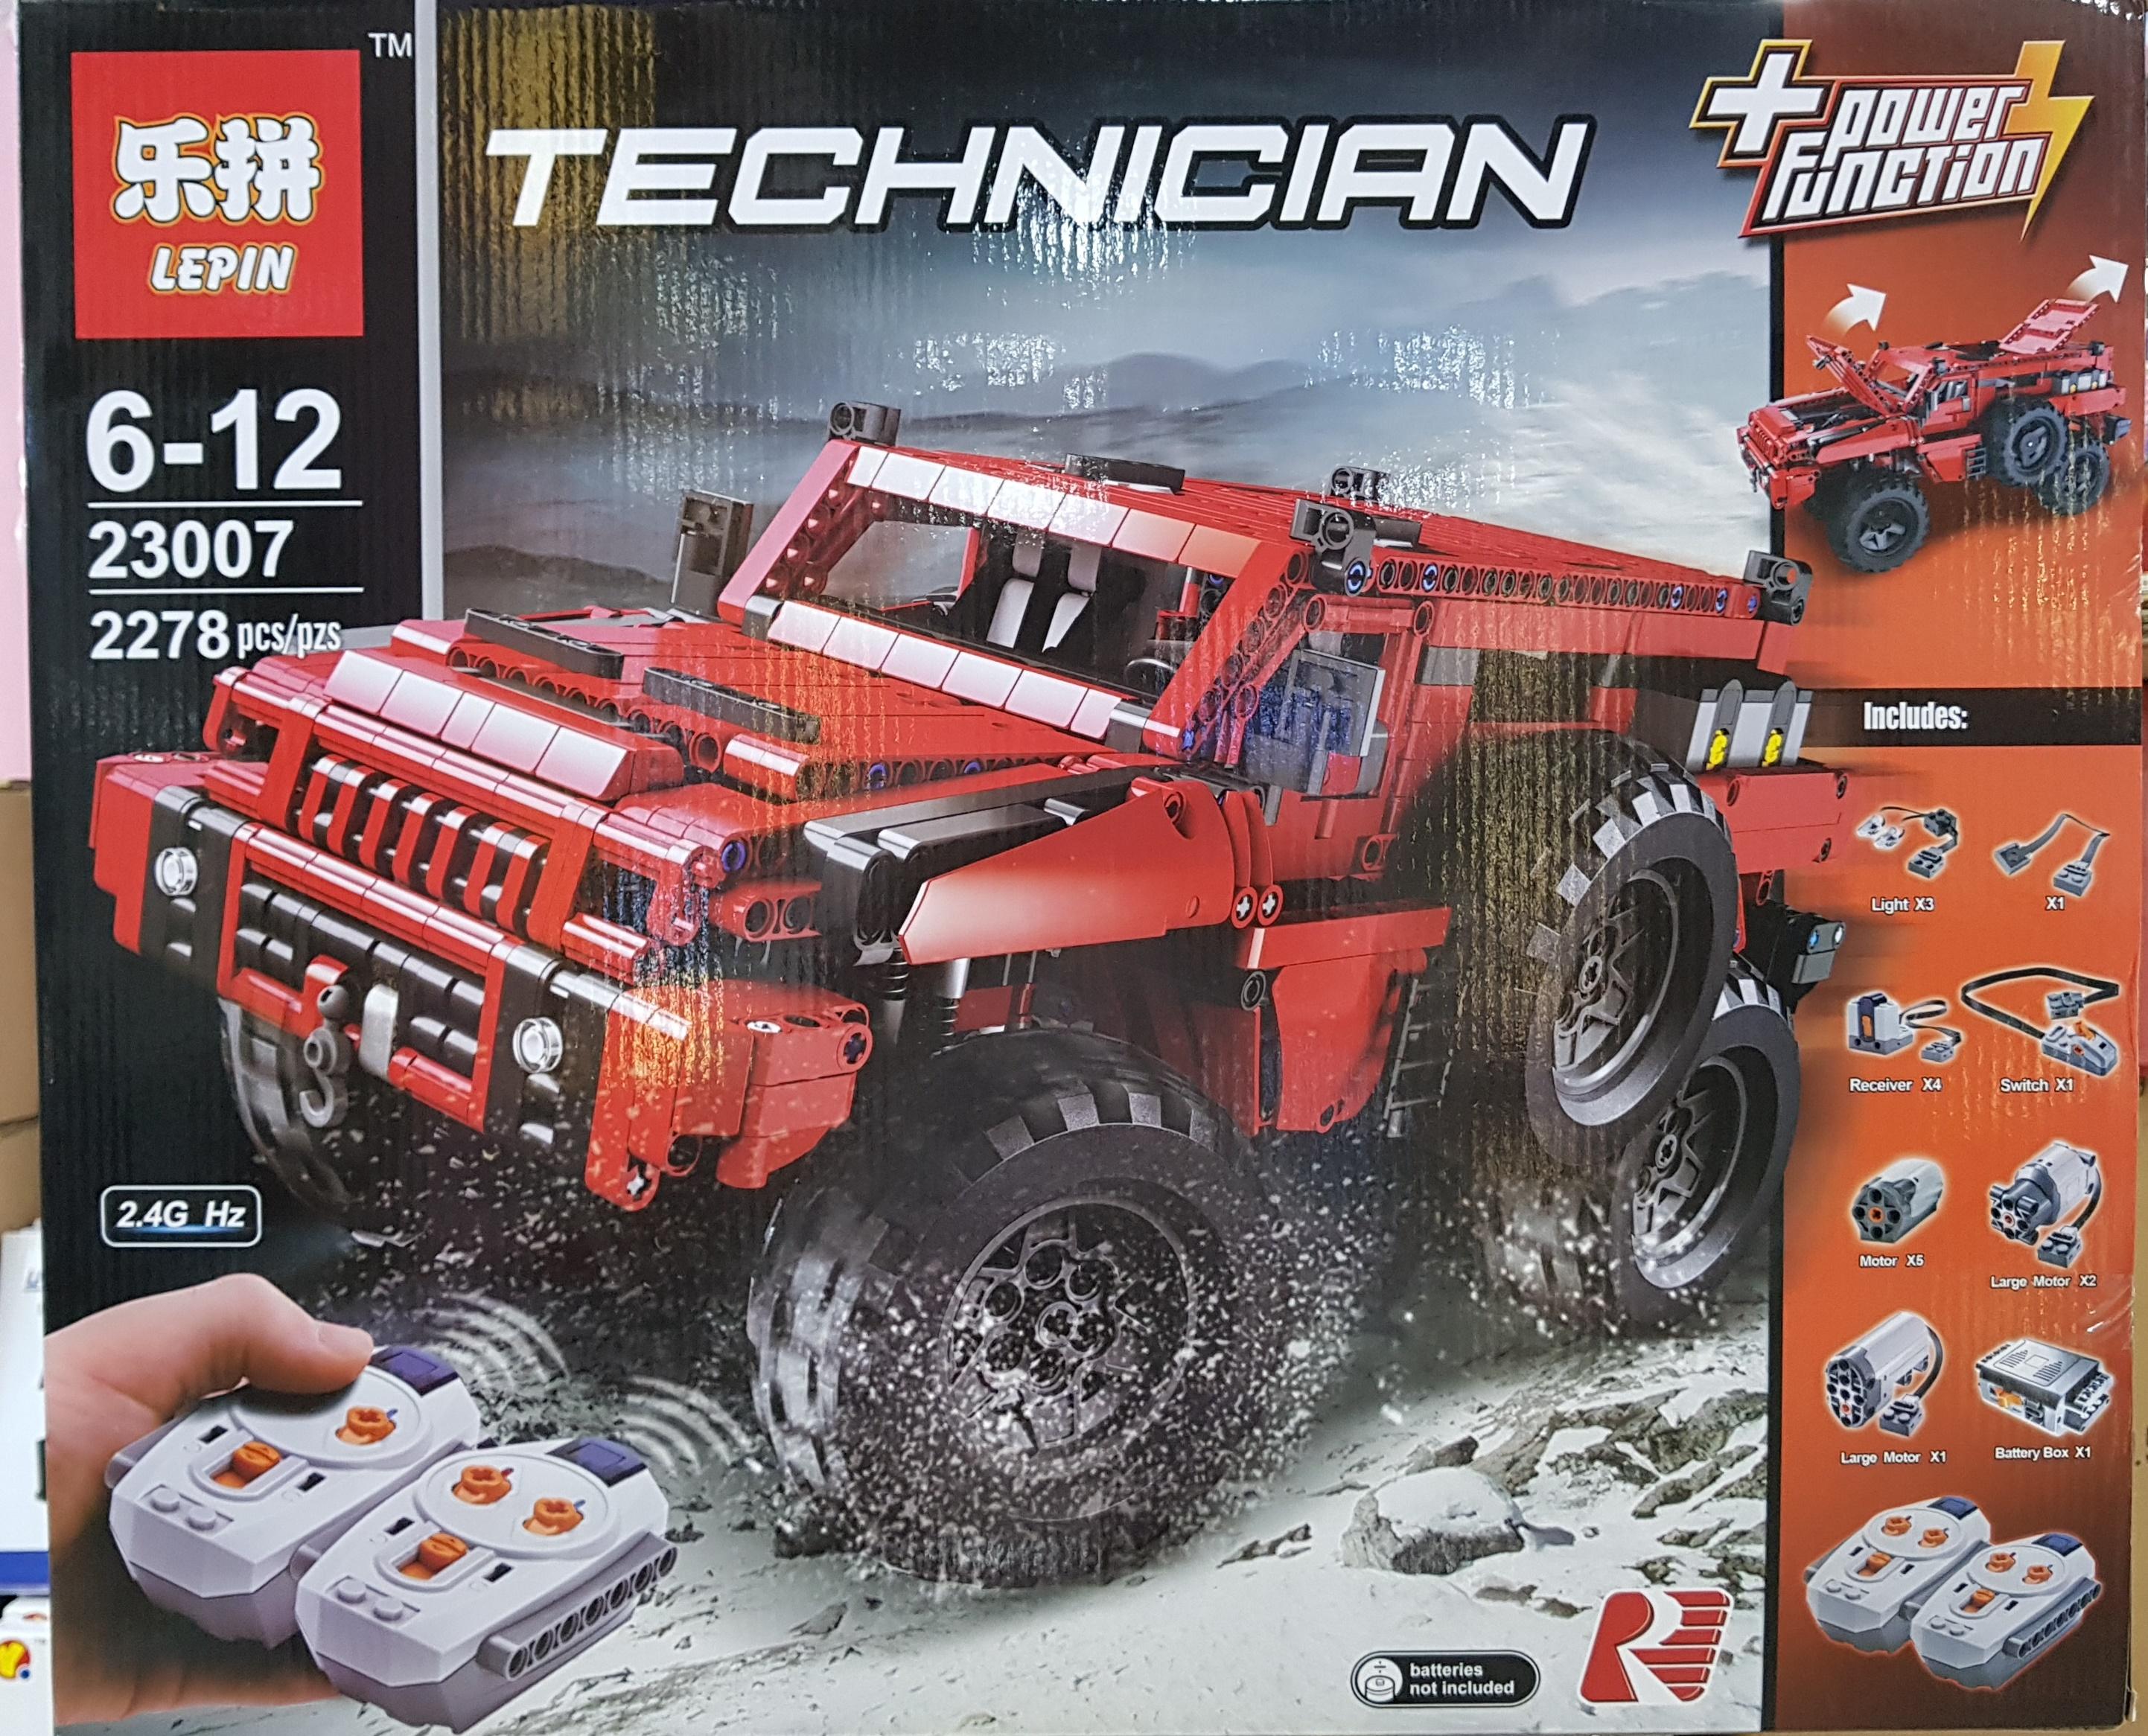 LEPIN TECHNICIAN 23007 (2278ชิ้น)